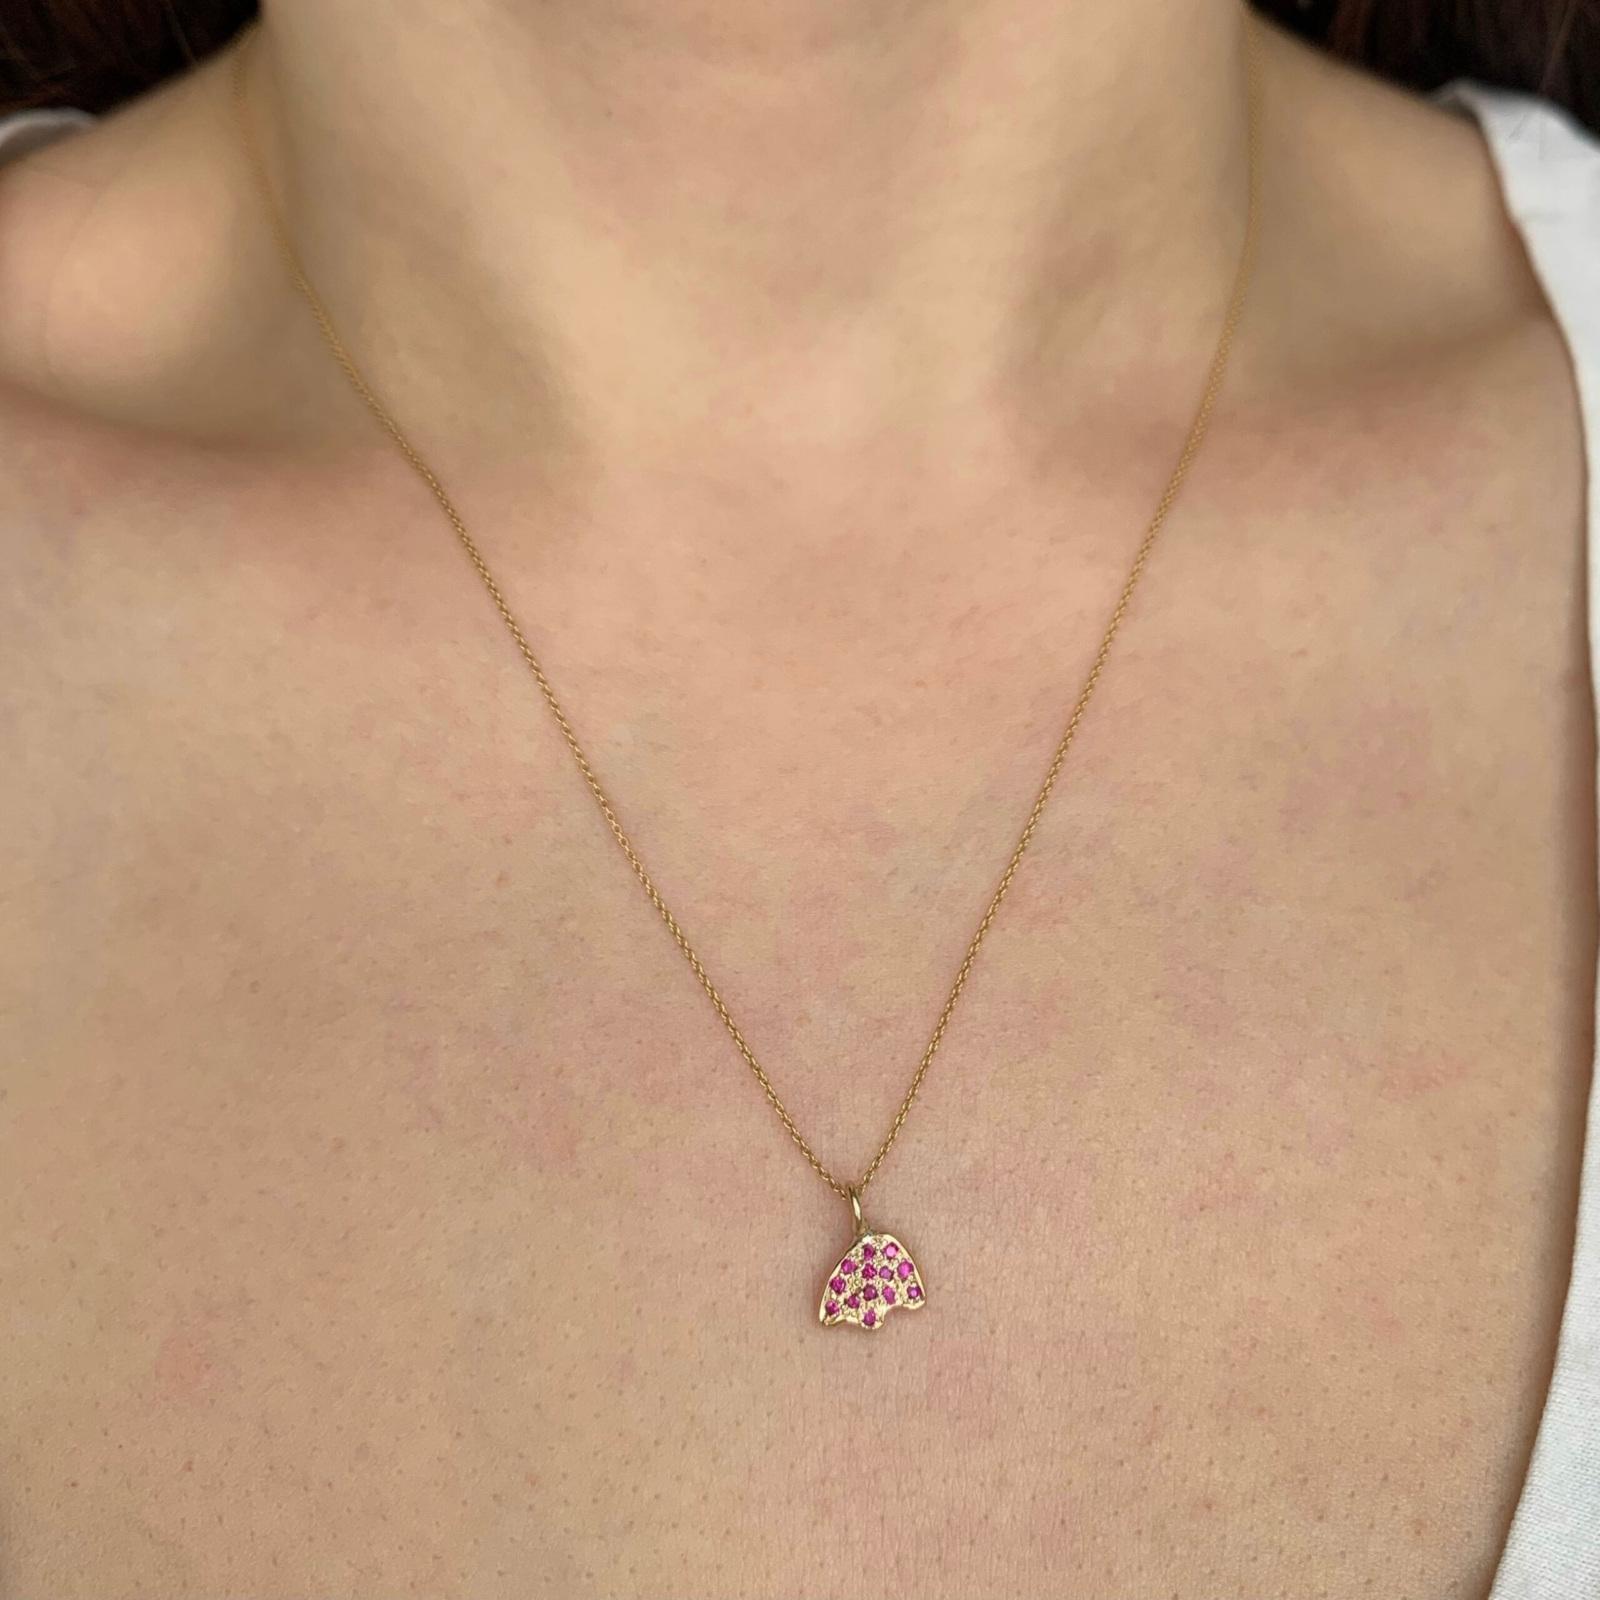 diamond bear charm necklace